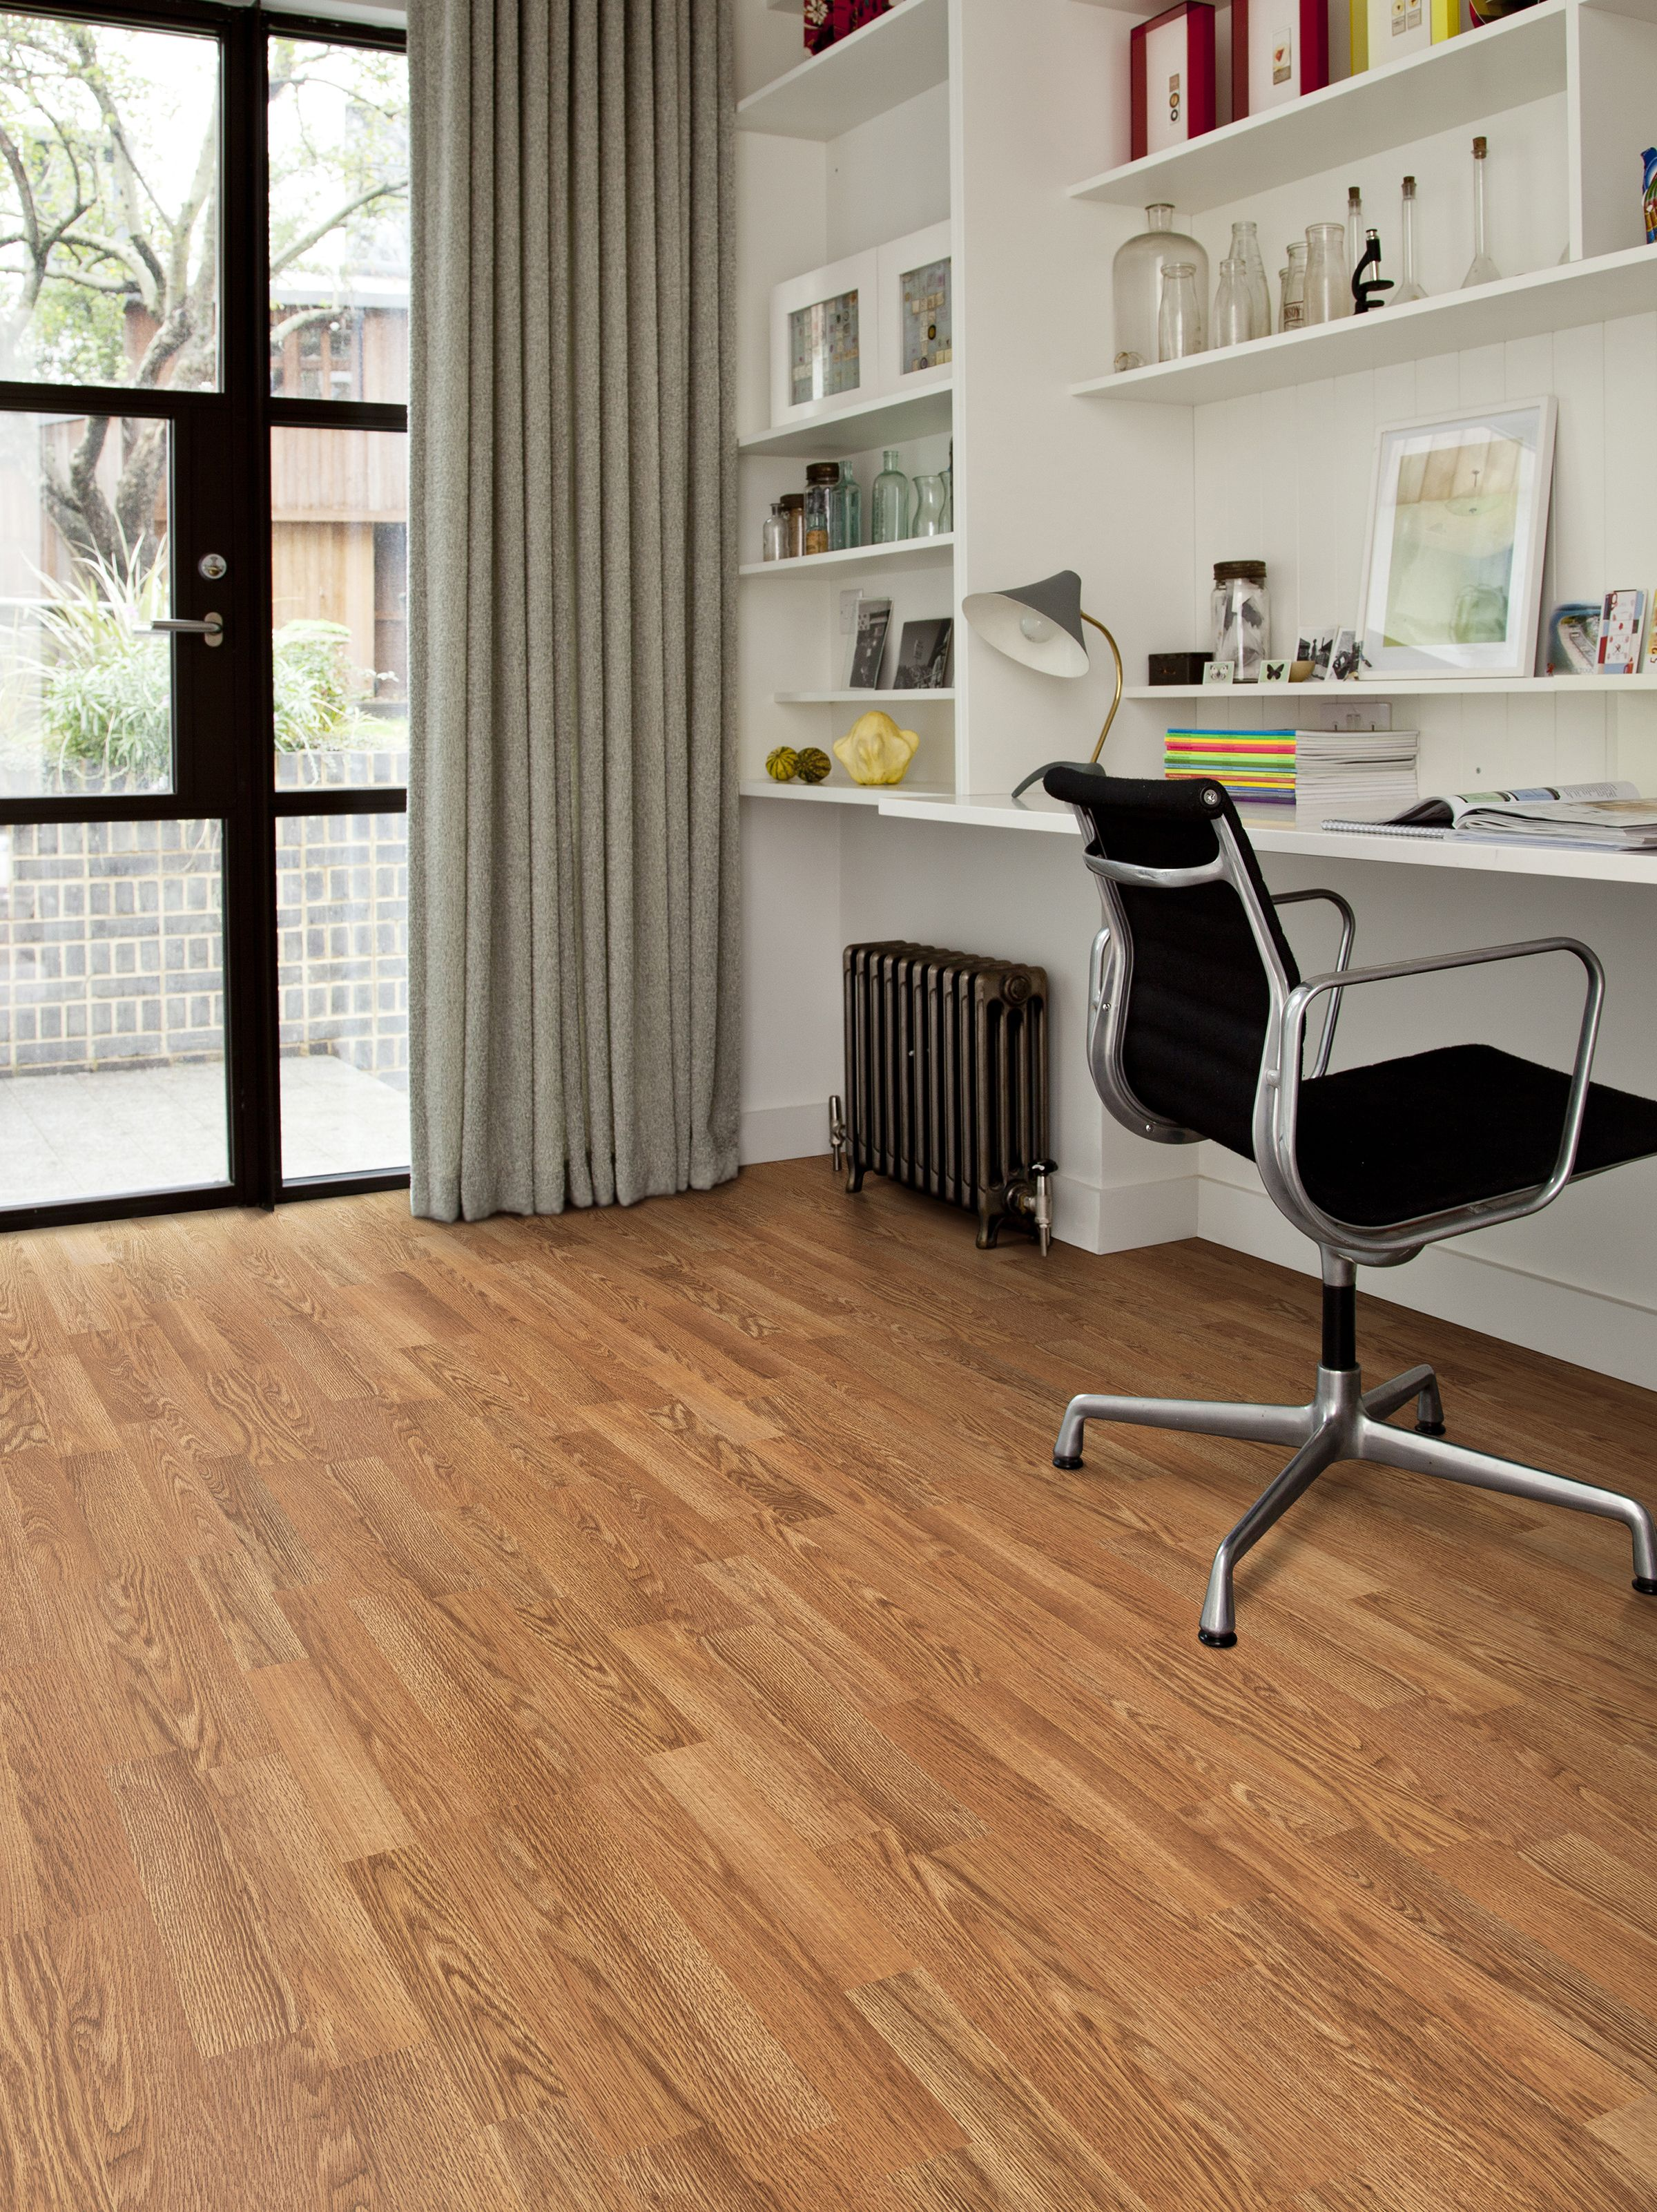 royal oak 258 laminate floors vitality laminate floors